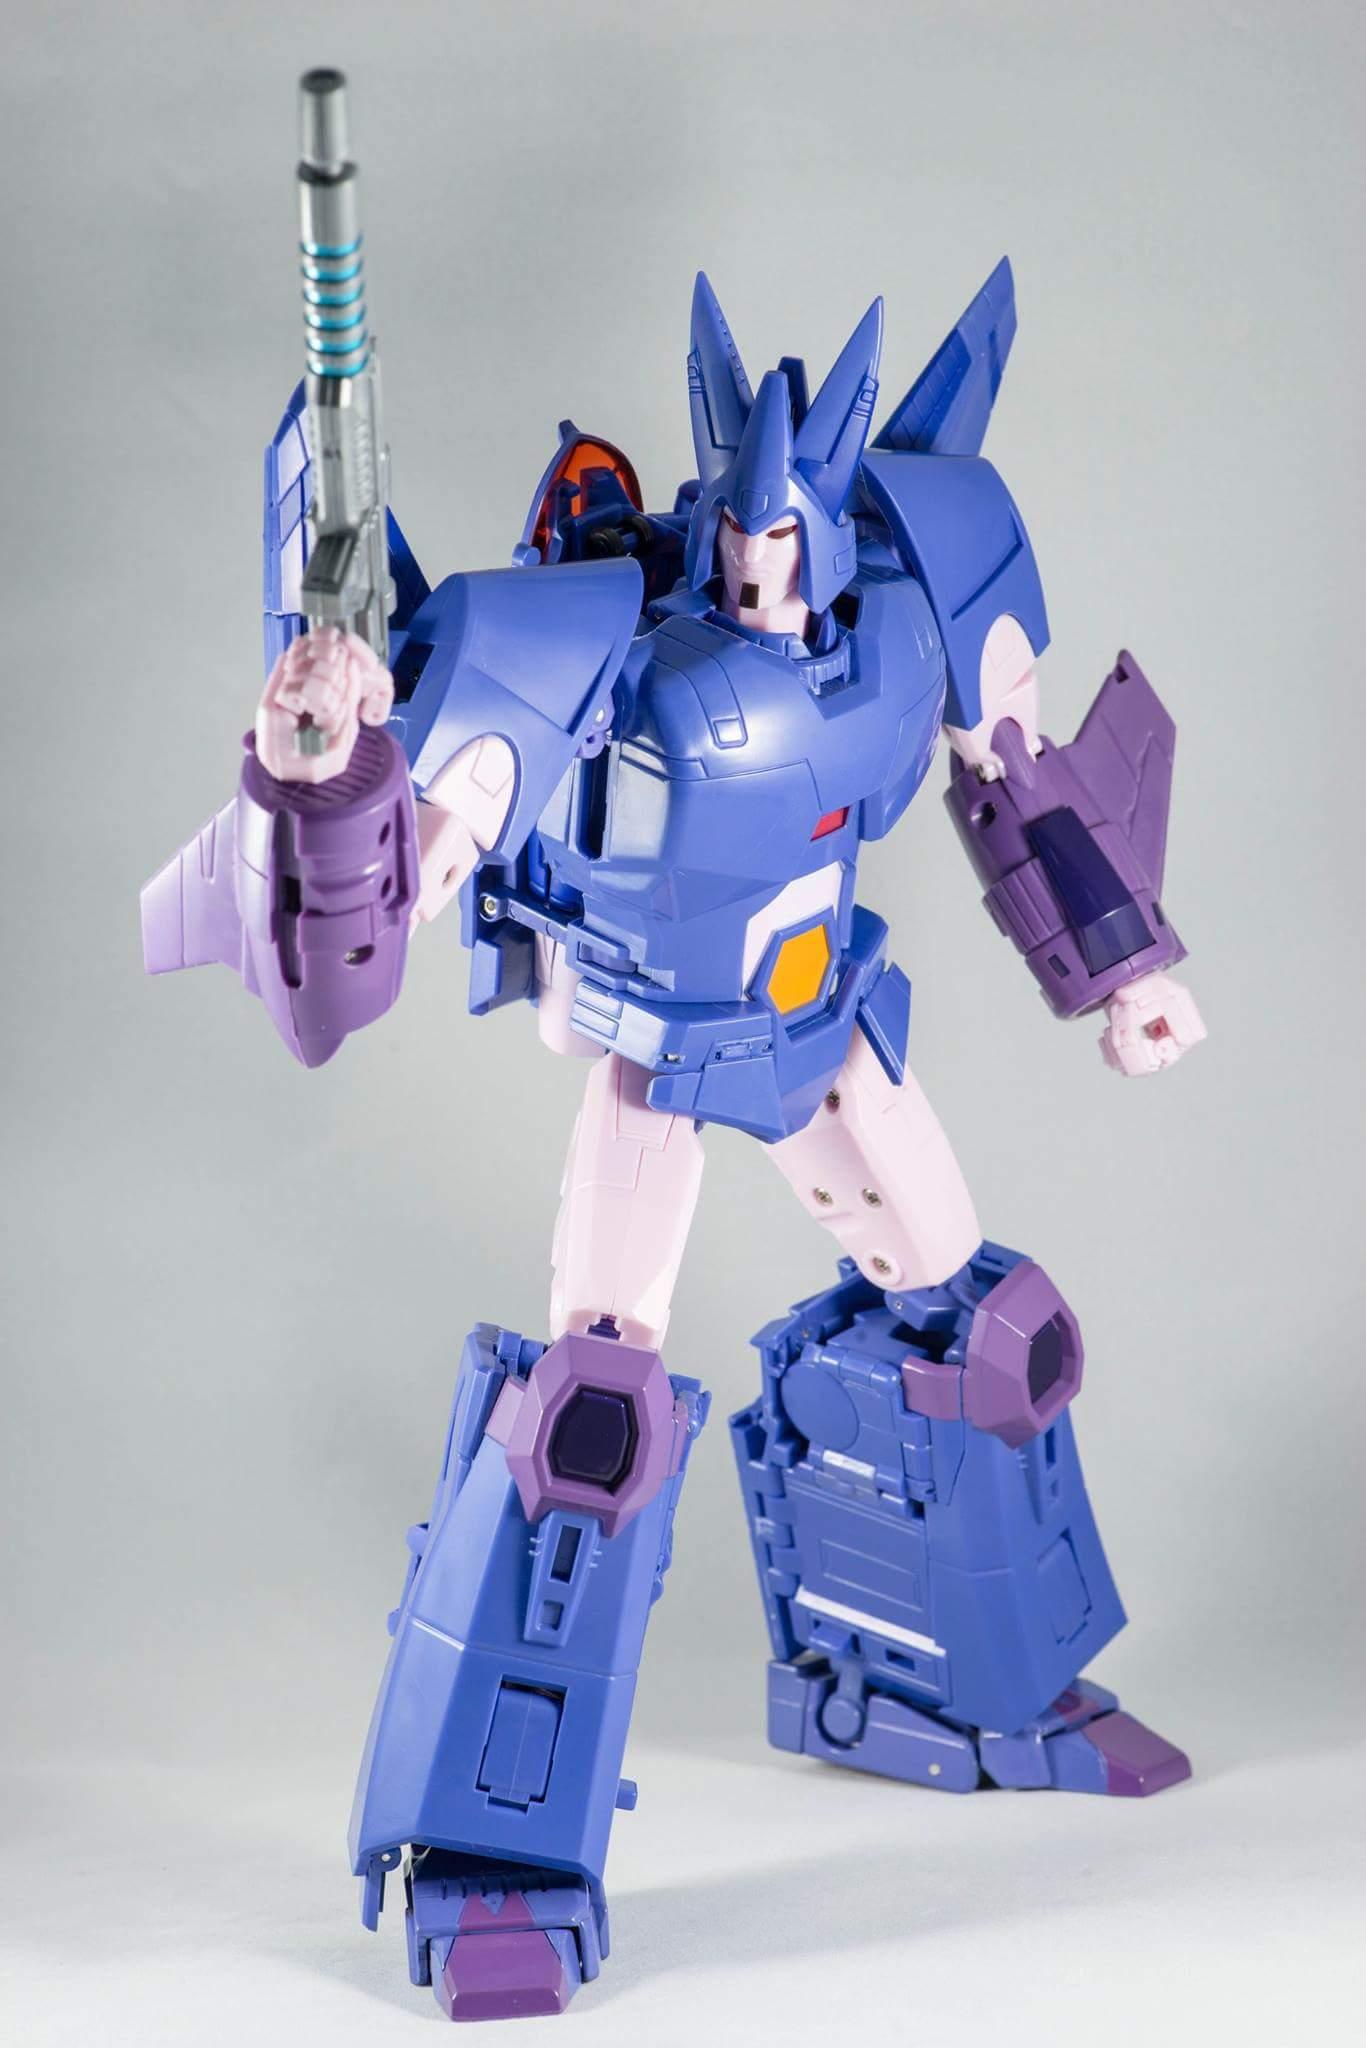 [X-Transbots] Produit Tiers - MX-III Eligos - aka Cyclonus - Page 3 A4GC44XA